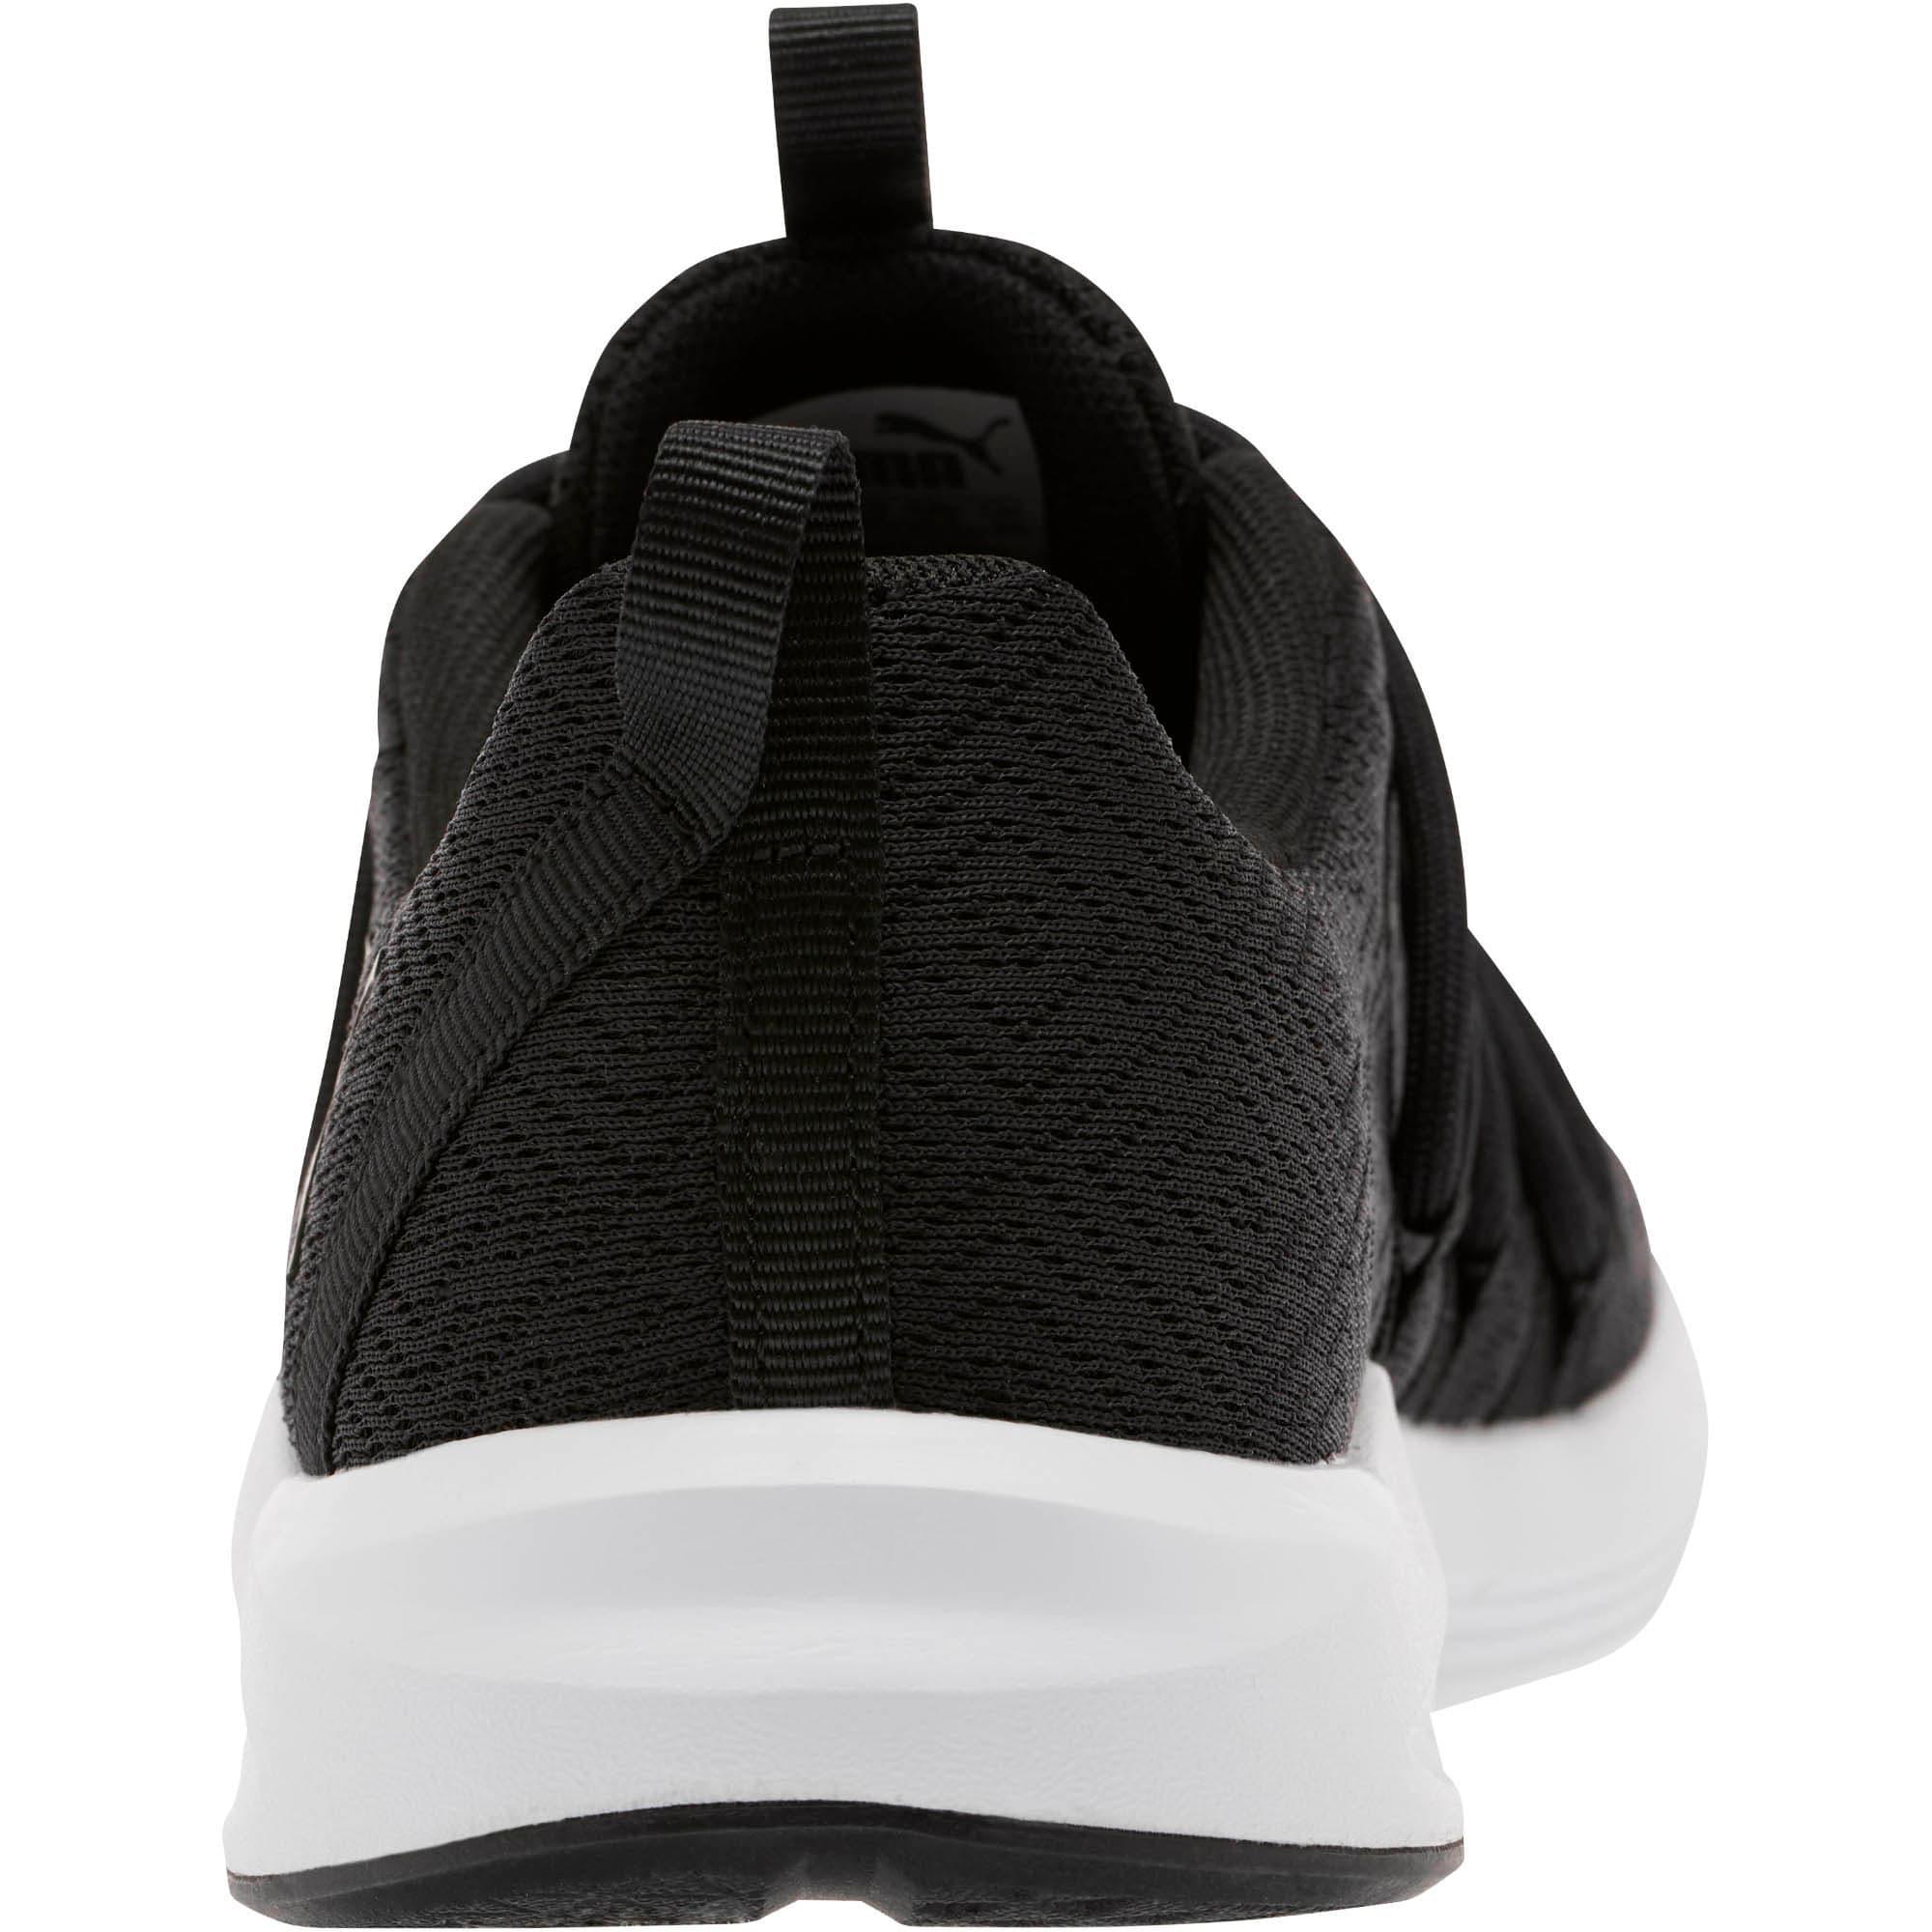 Thumbnail 3 of Prowl Alt Stellar Women's Training Shoes, Puma Black-Puma White, medium